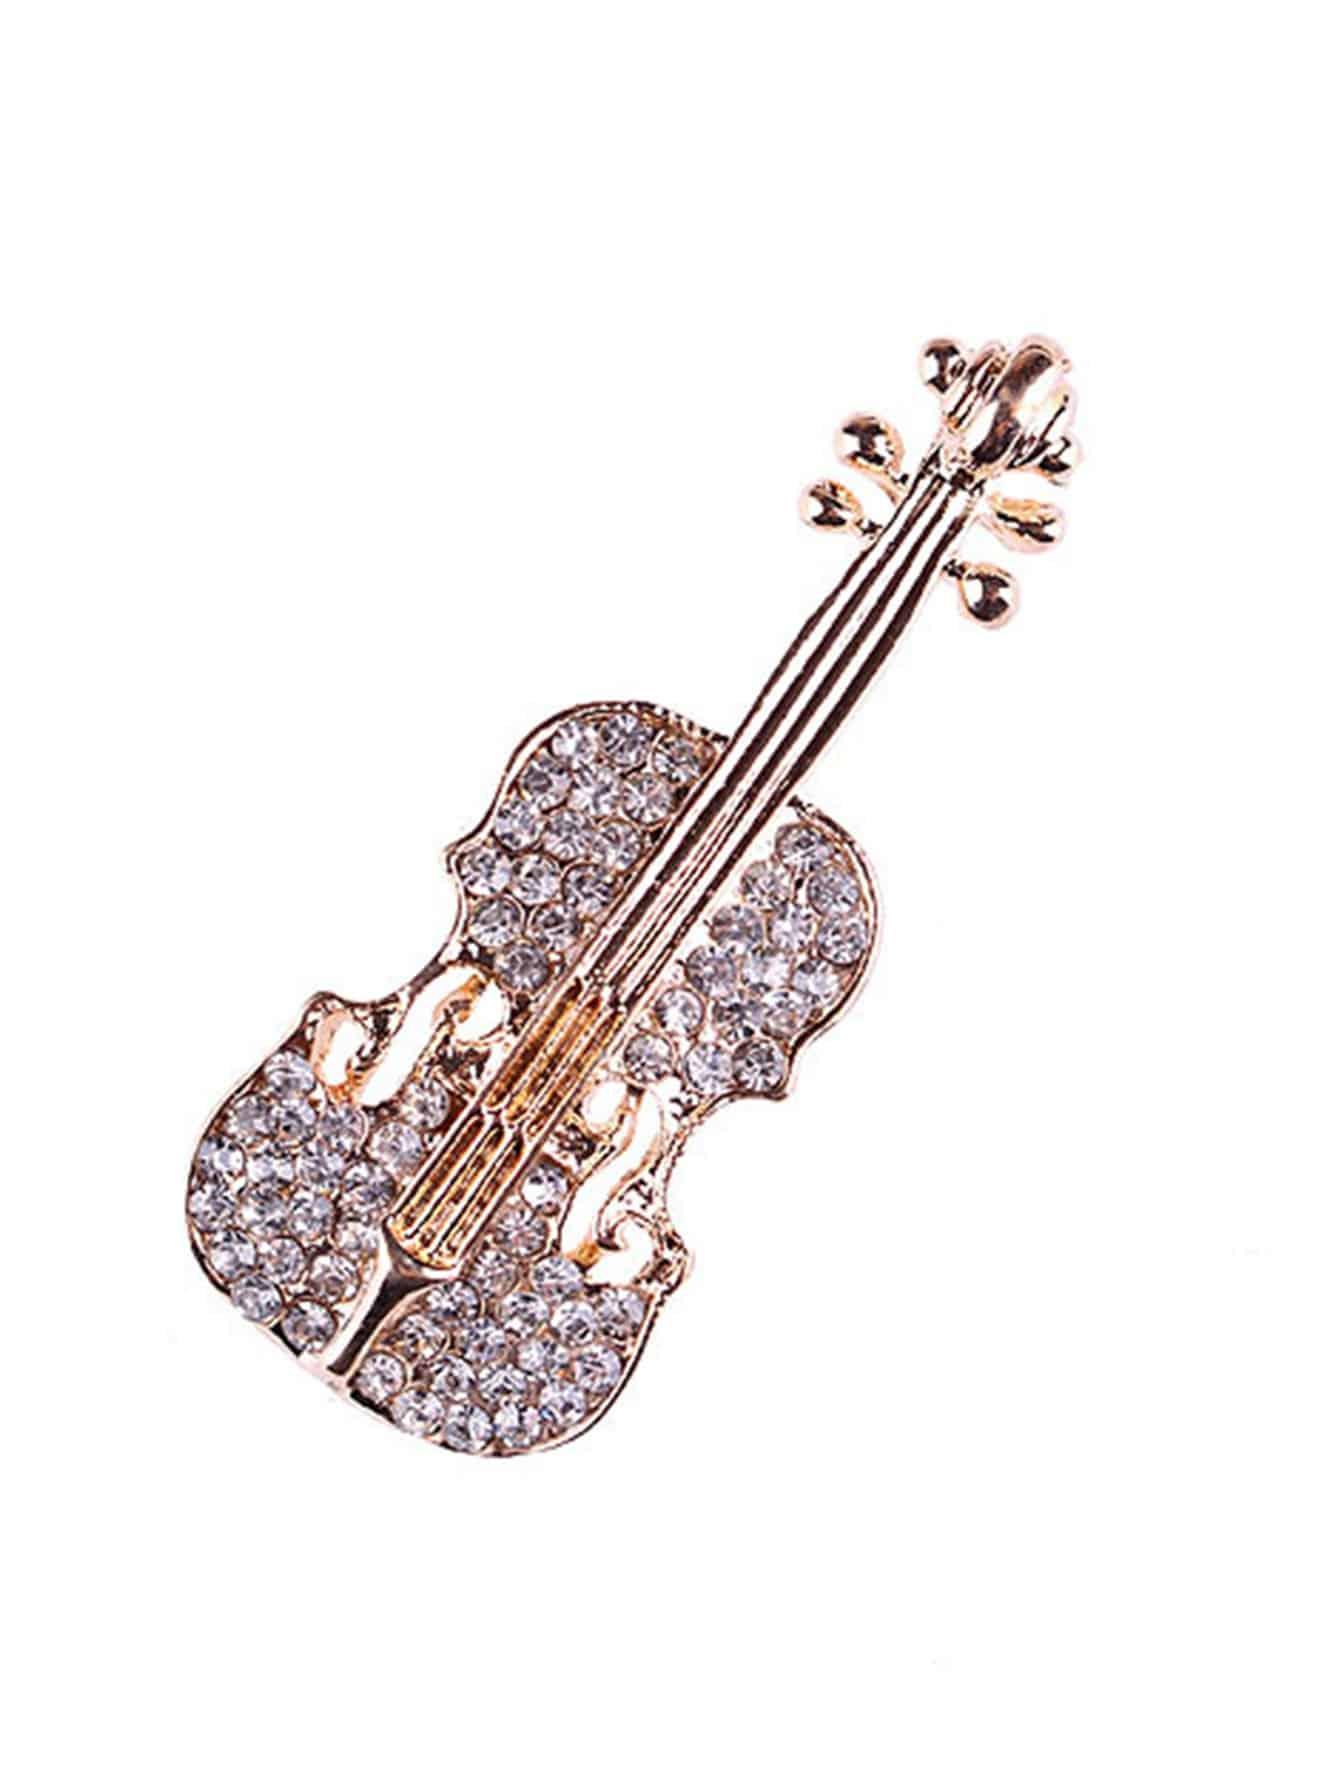 Rhinestone Violin Shaped Brooch